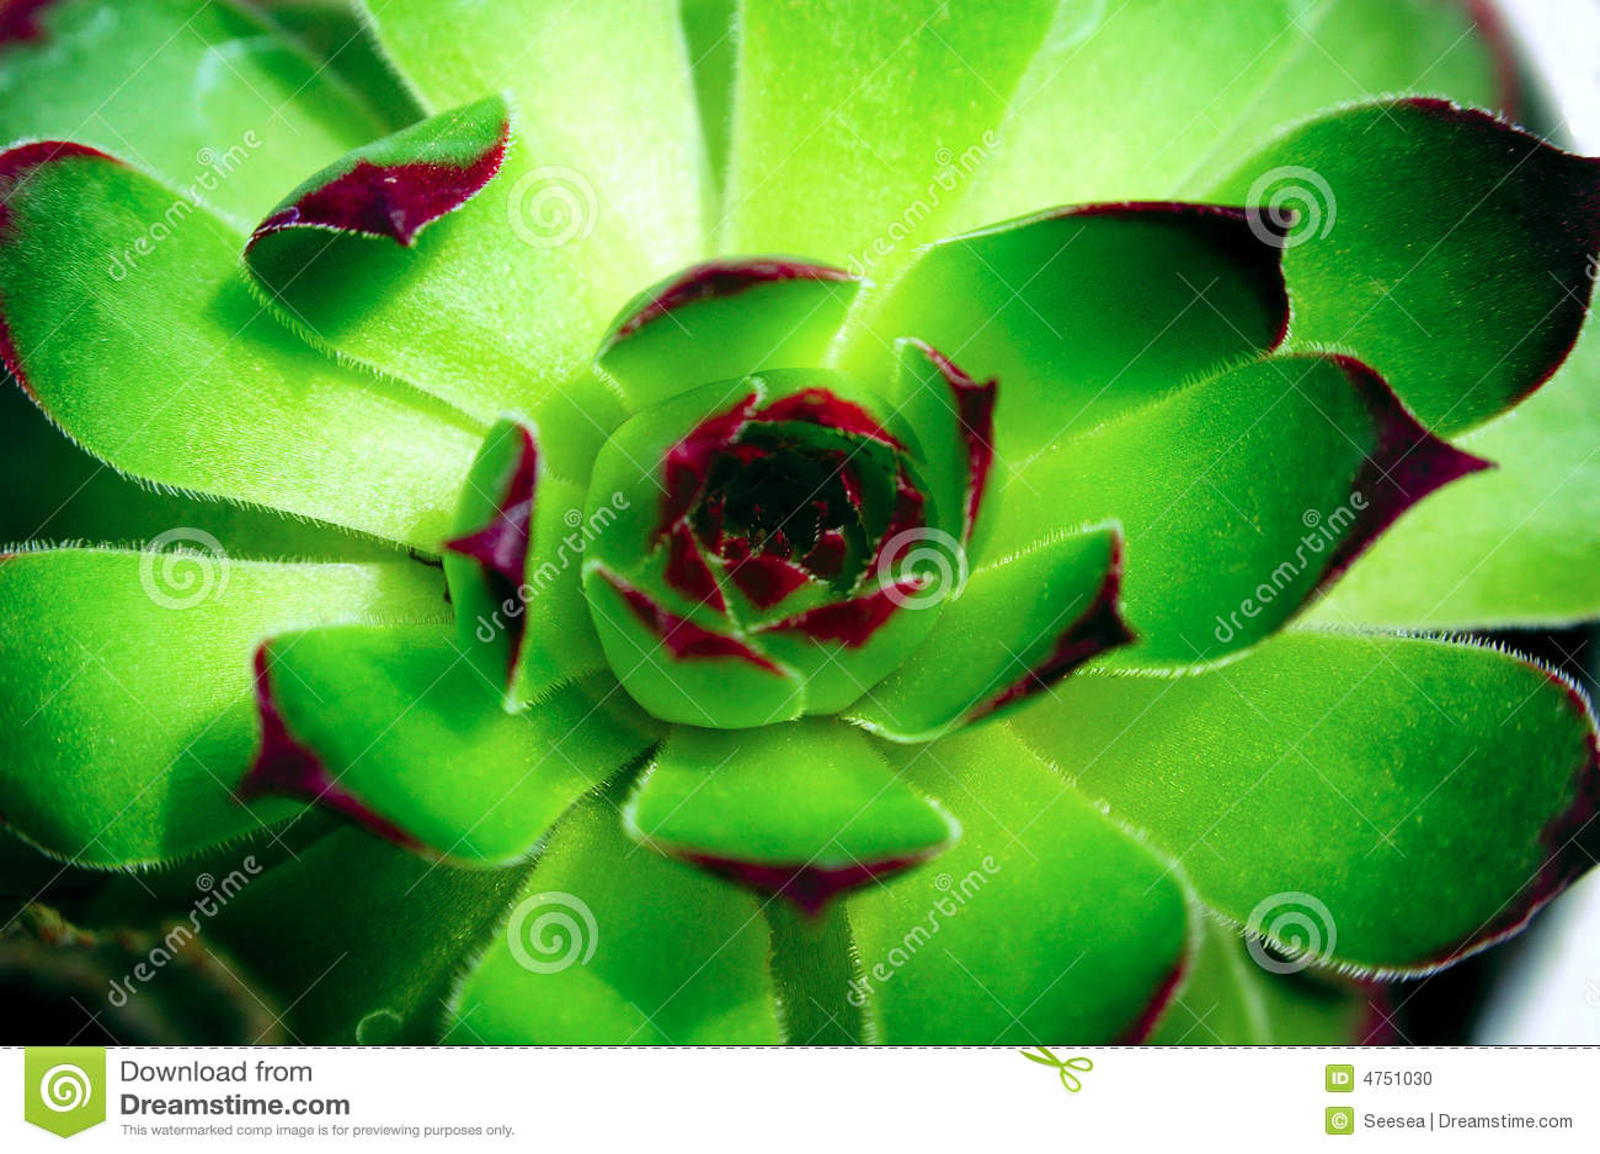 Succulent green